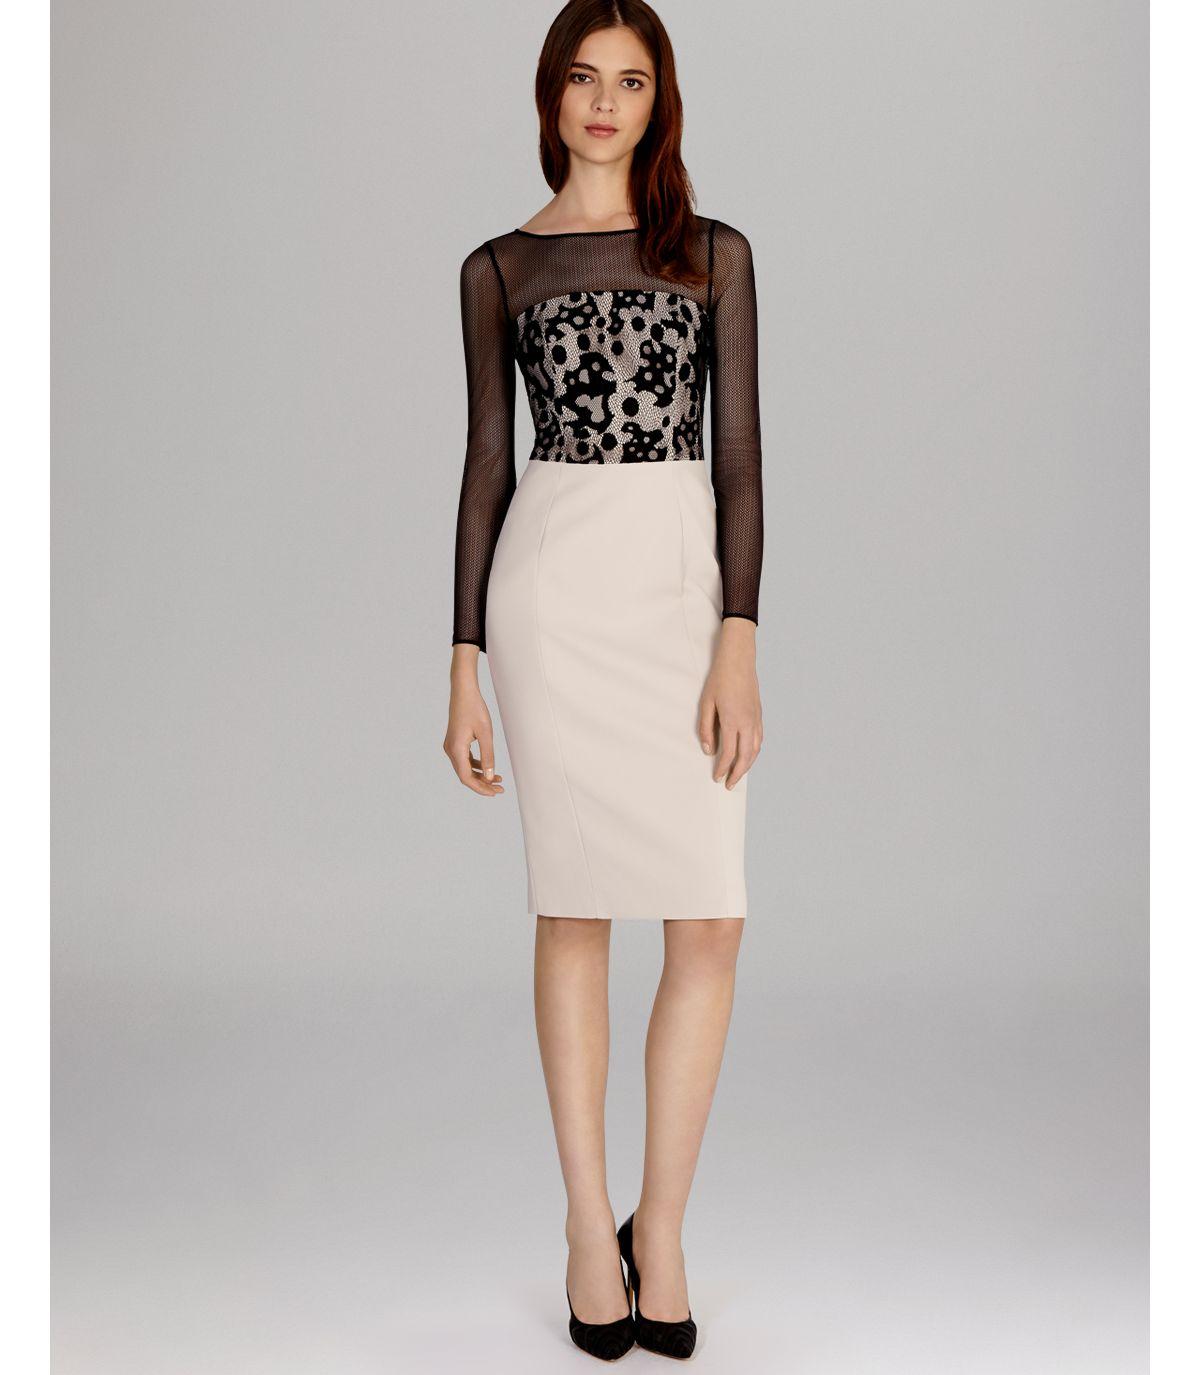 Lyst - Karen Millen Dress Camouflage Lace in Black